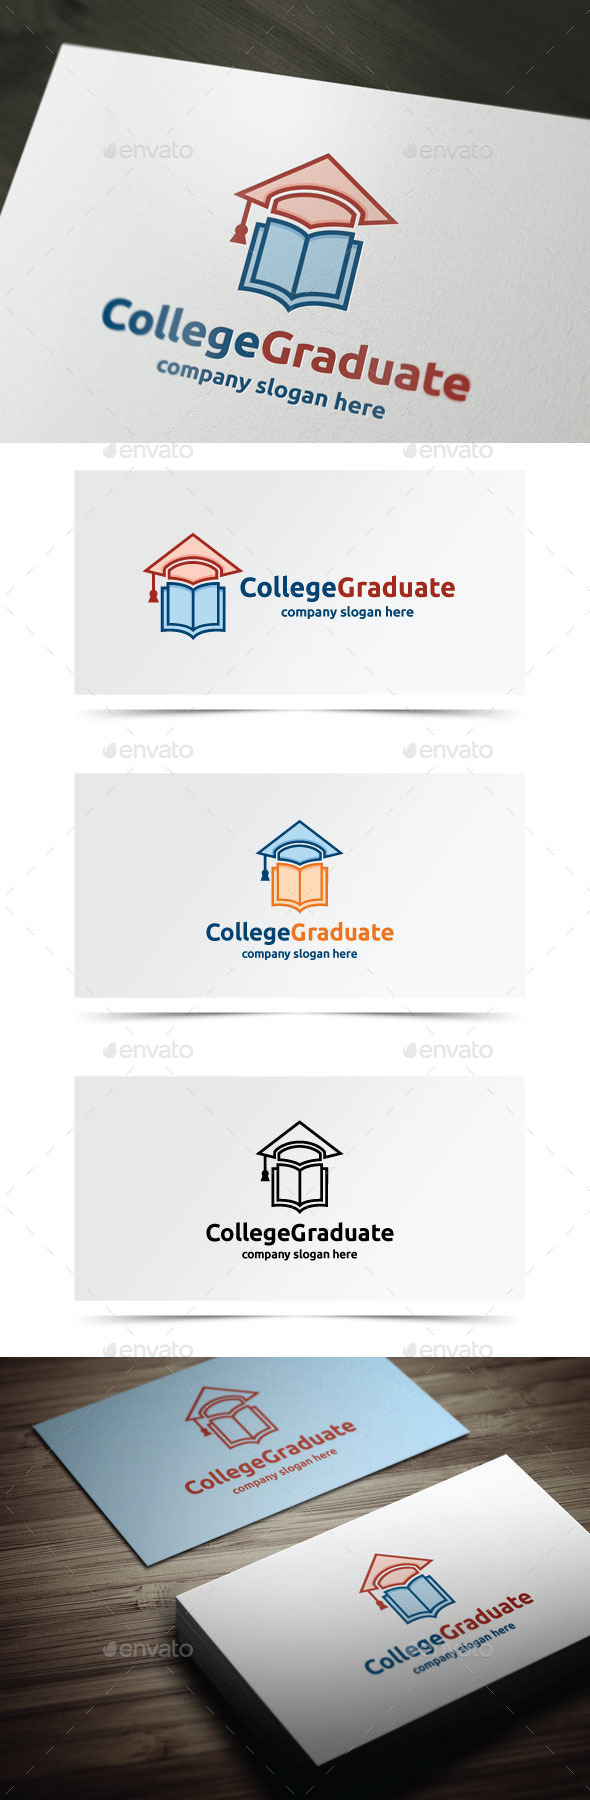 College Graduate - College Logo Templates